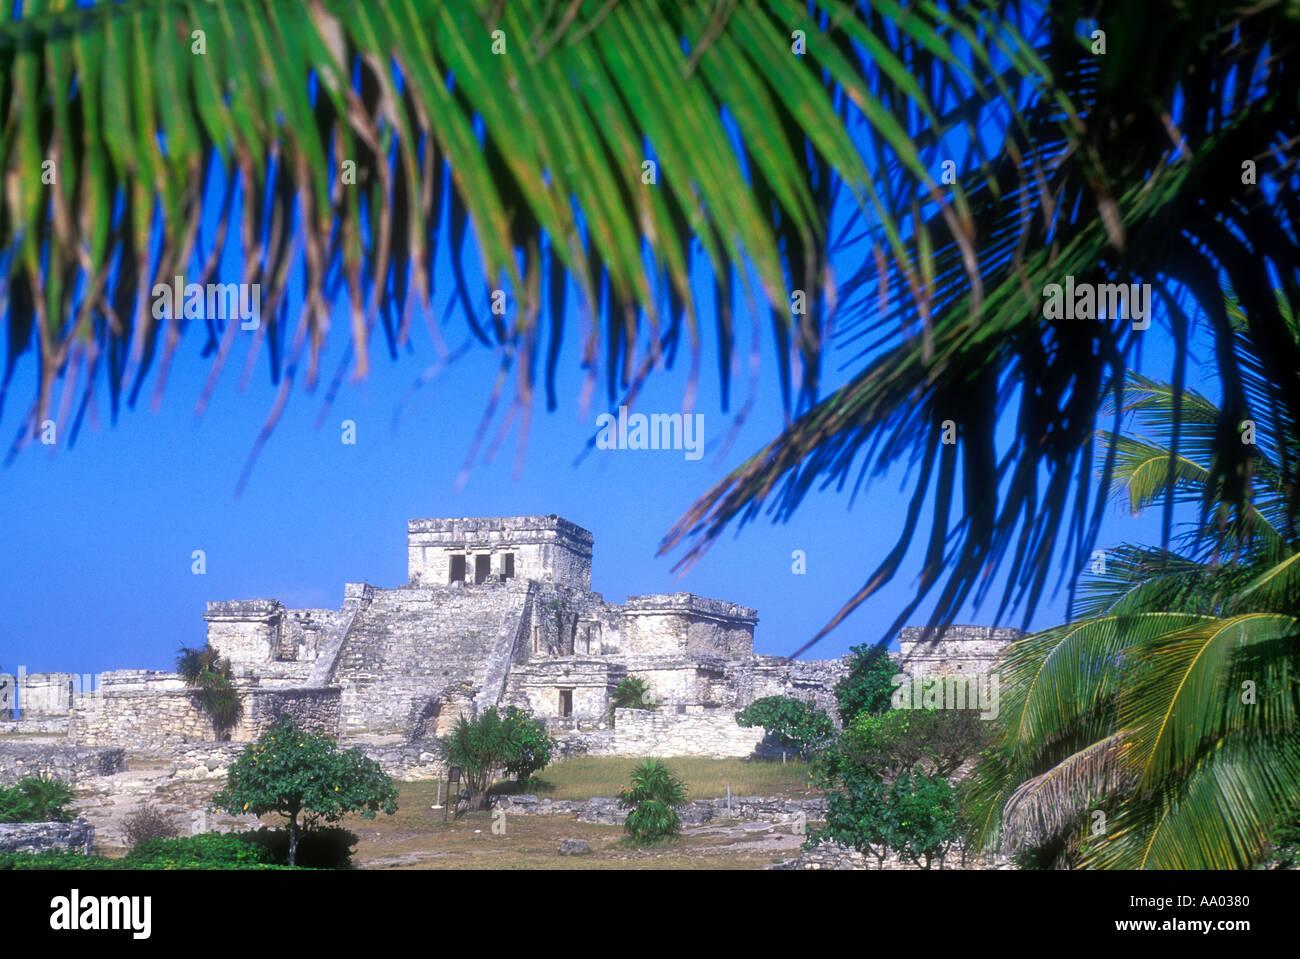 Mayan ruins at Tulum Quintana Roo Mexico - Stock Image